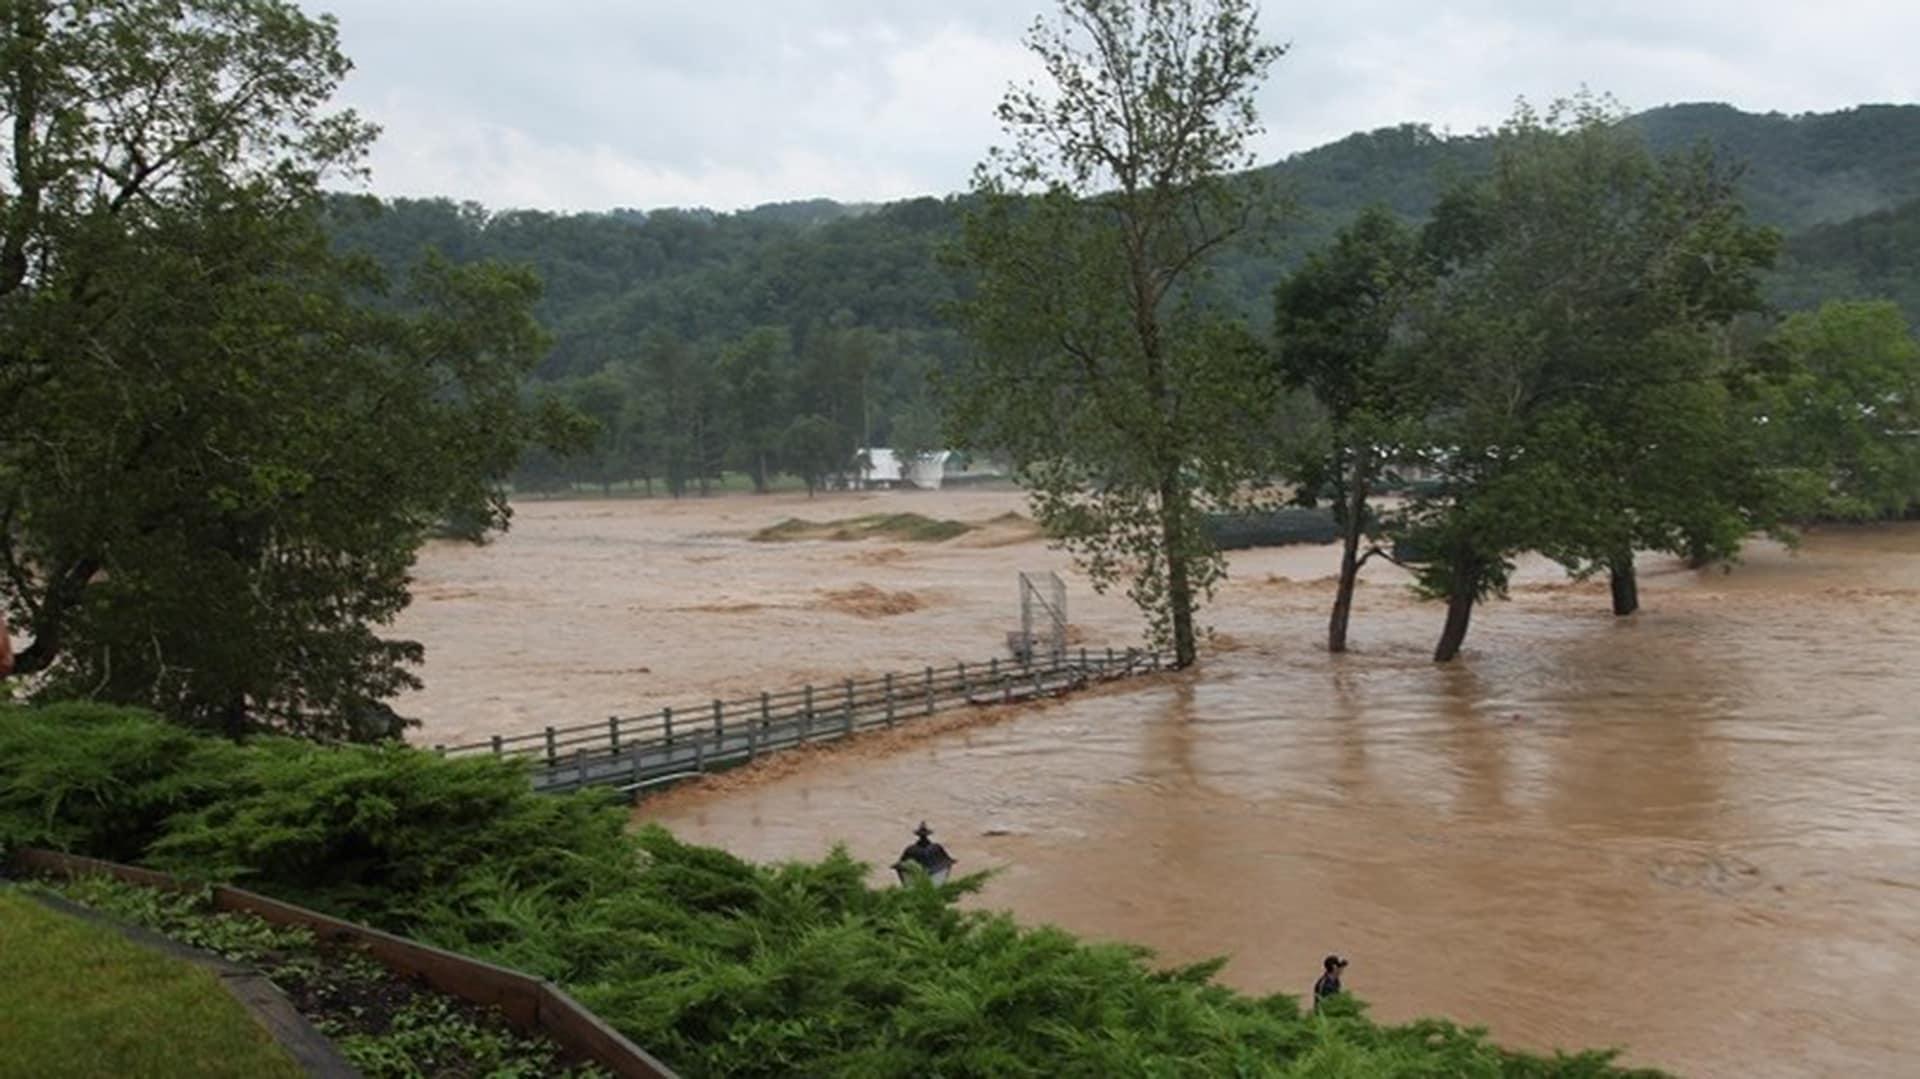 Pga Tour Official Details Floods In West Virginia Golf